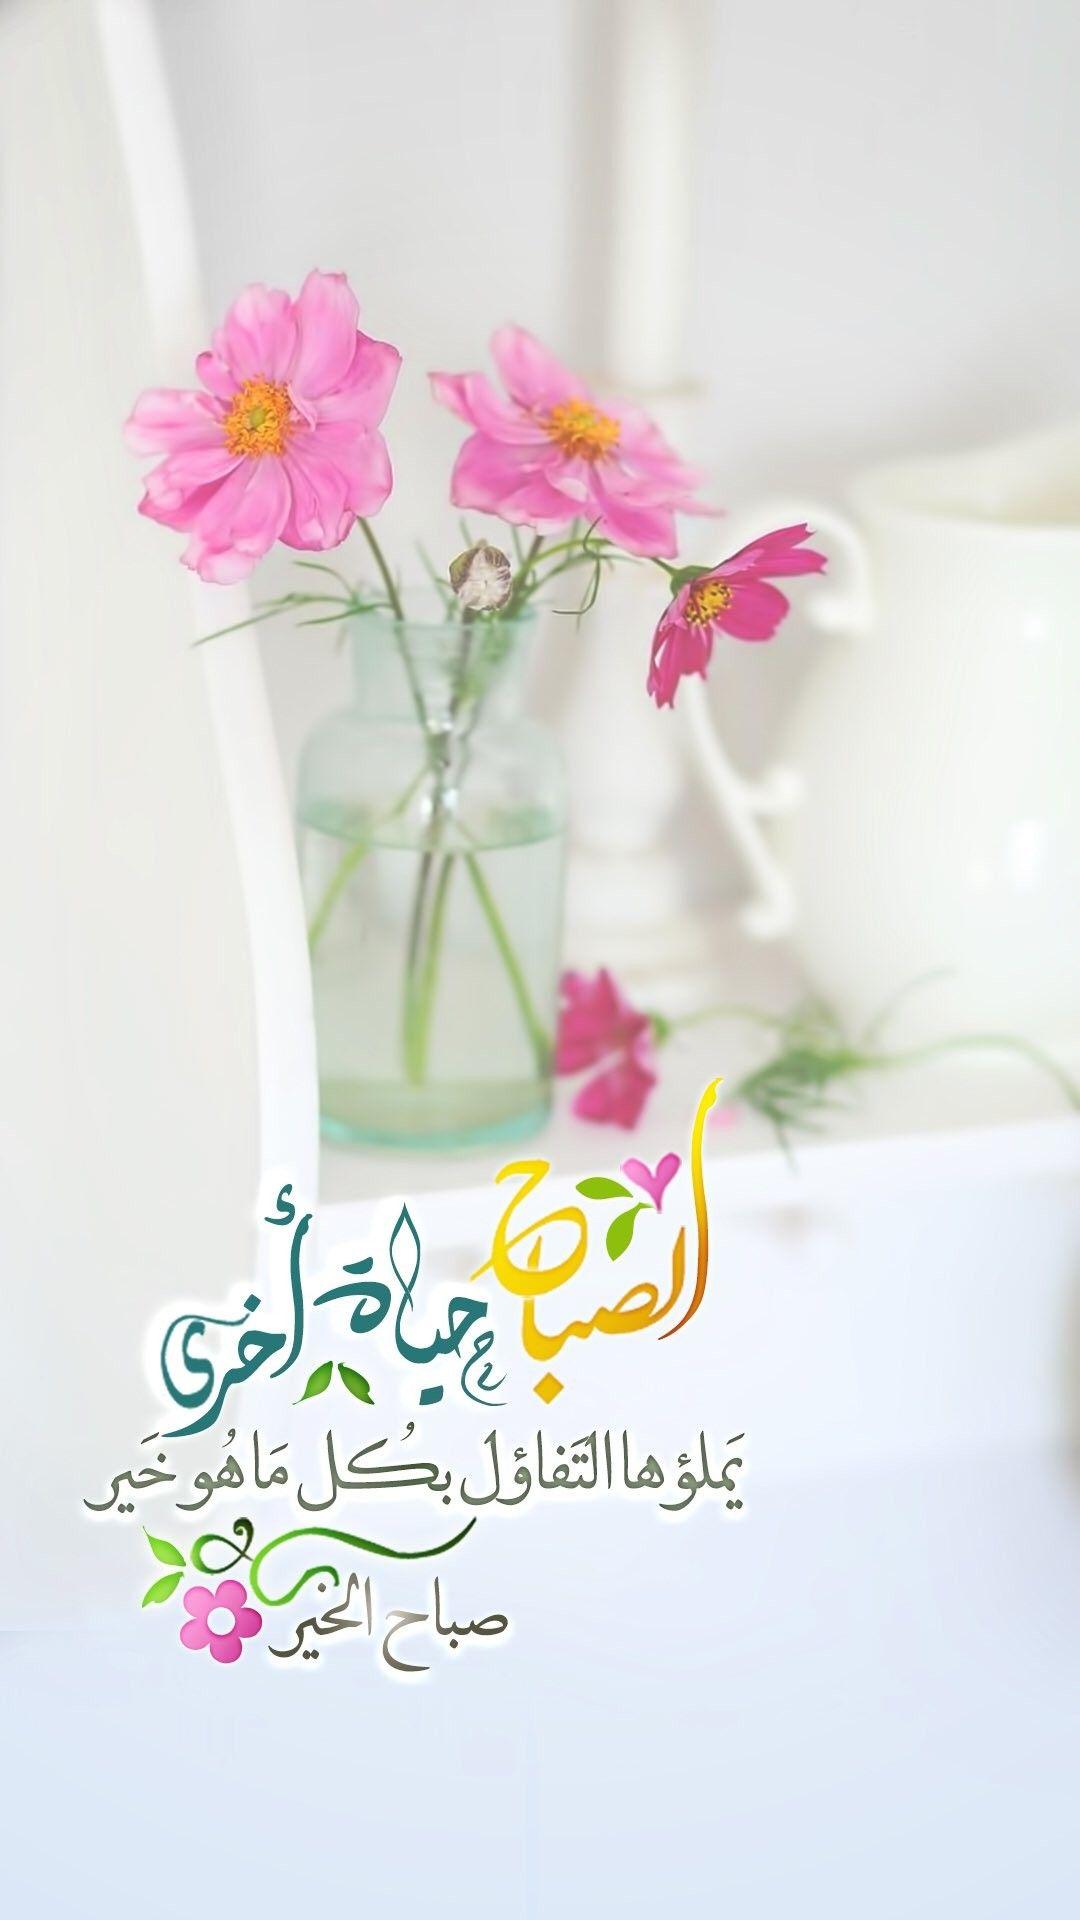 Pin By Hanan Farah On Good Morning Images Morning Greeting Good Morning Images Friday Messages